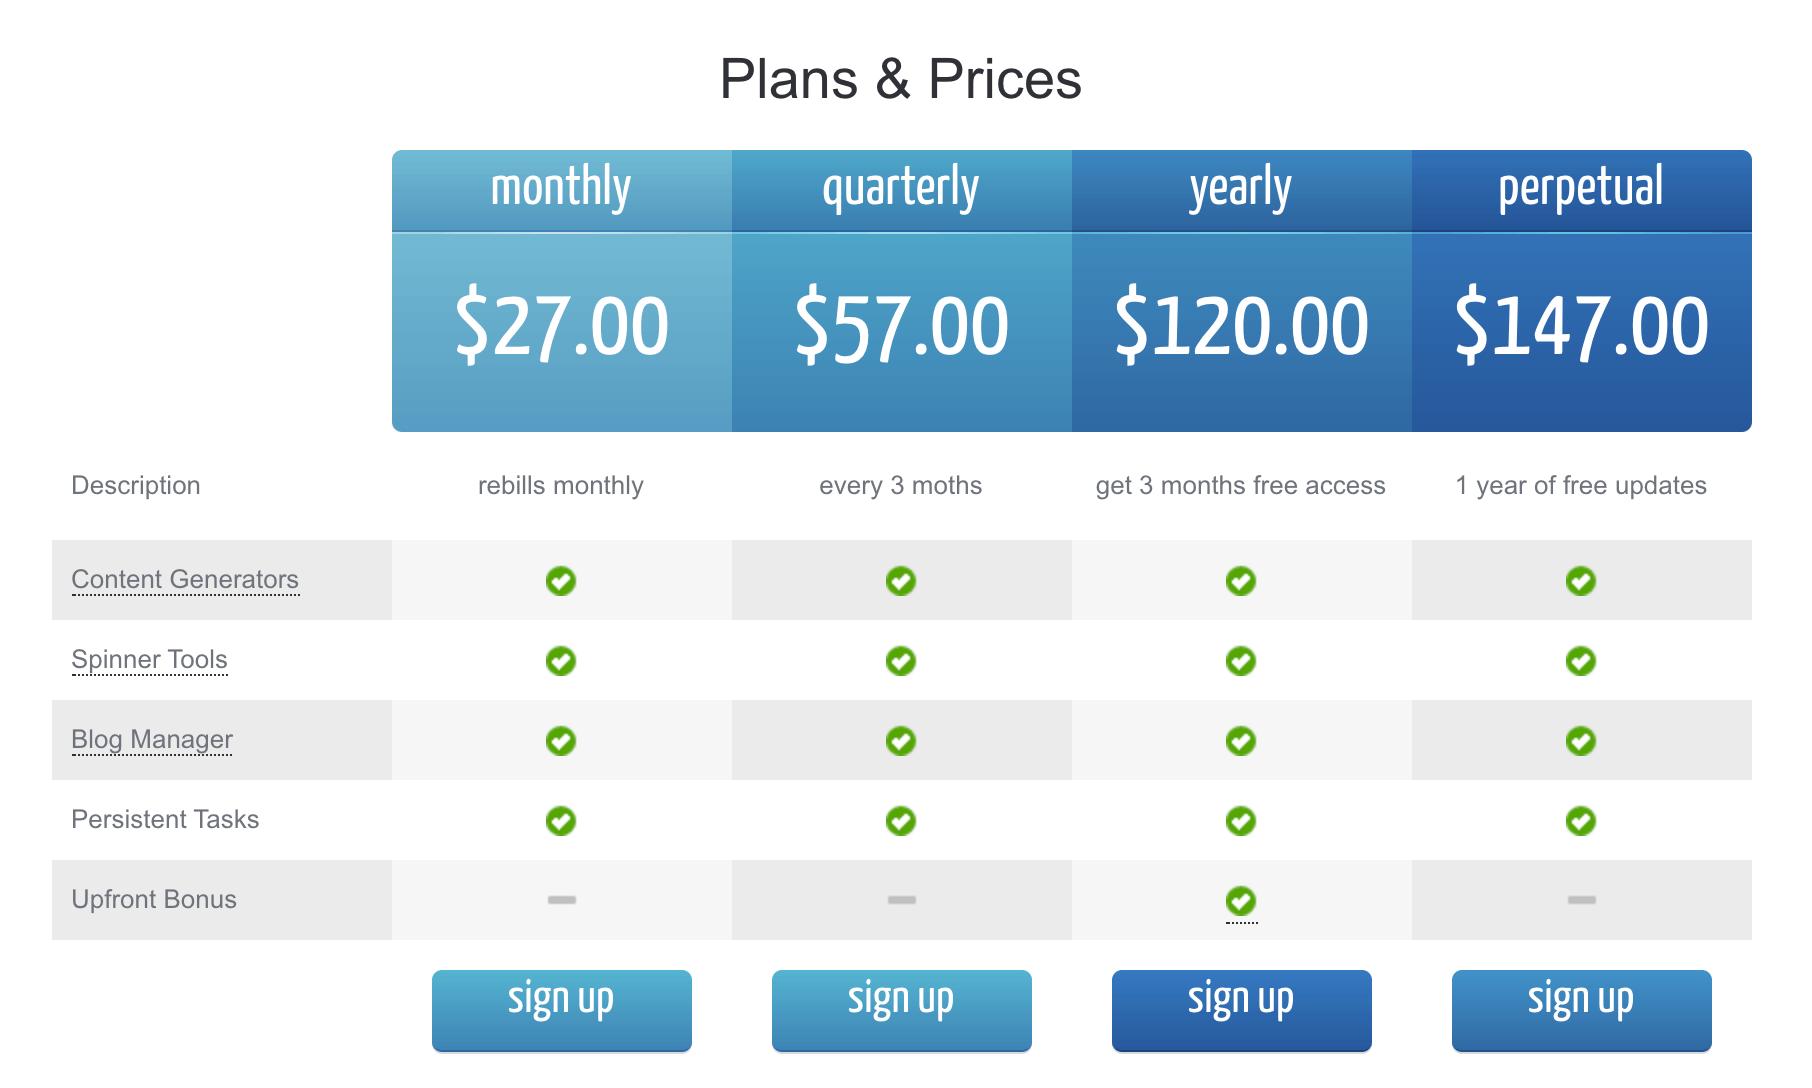 seo-content-machine-price-plans